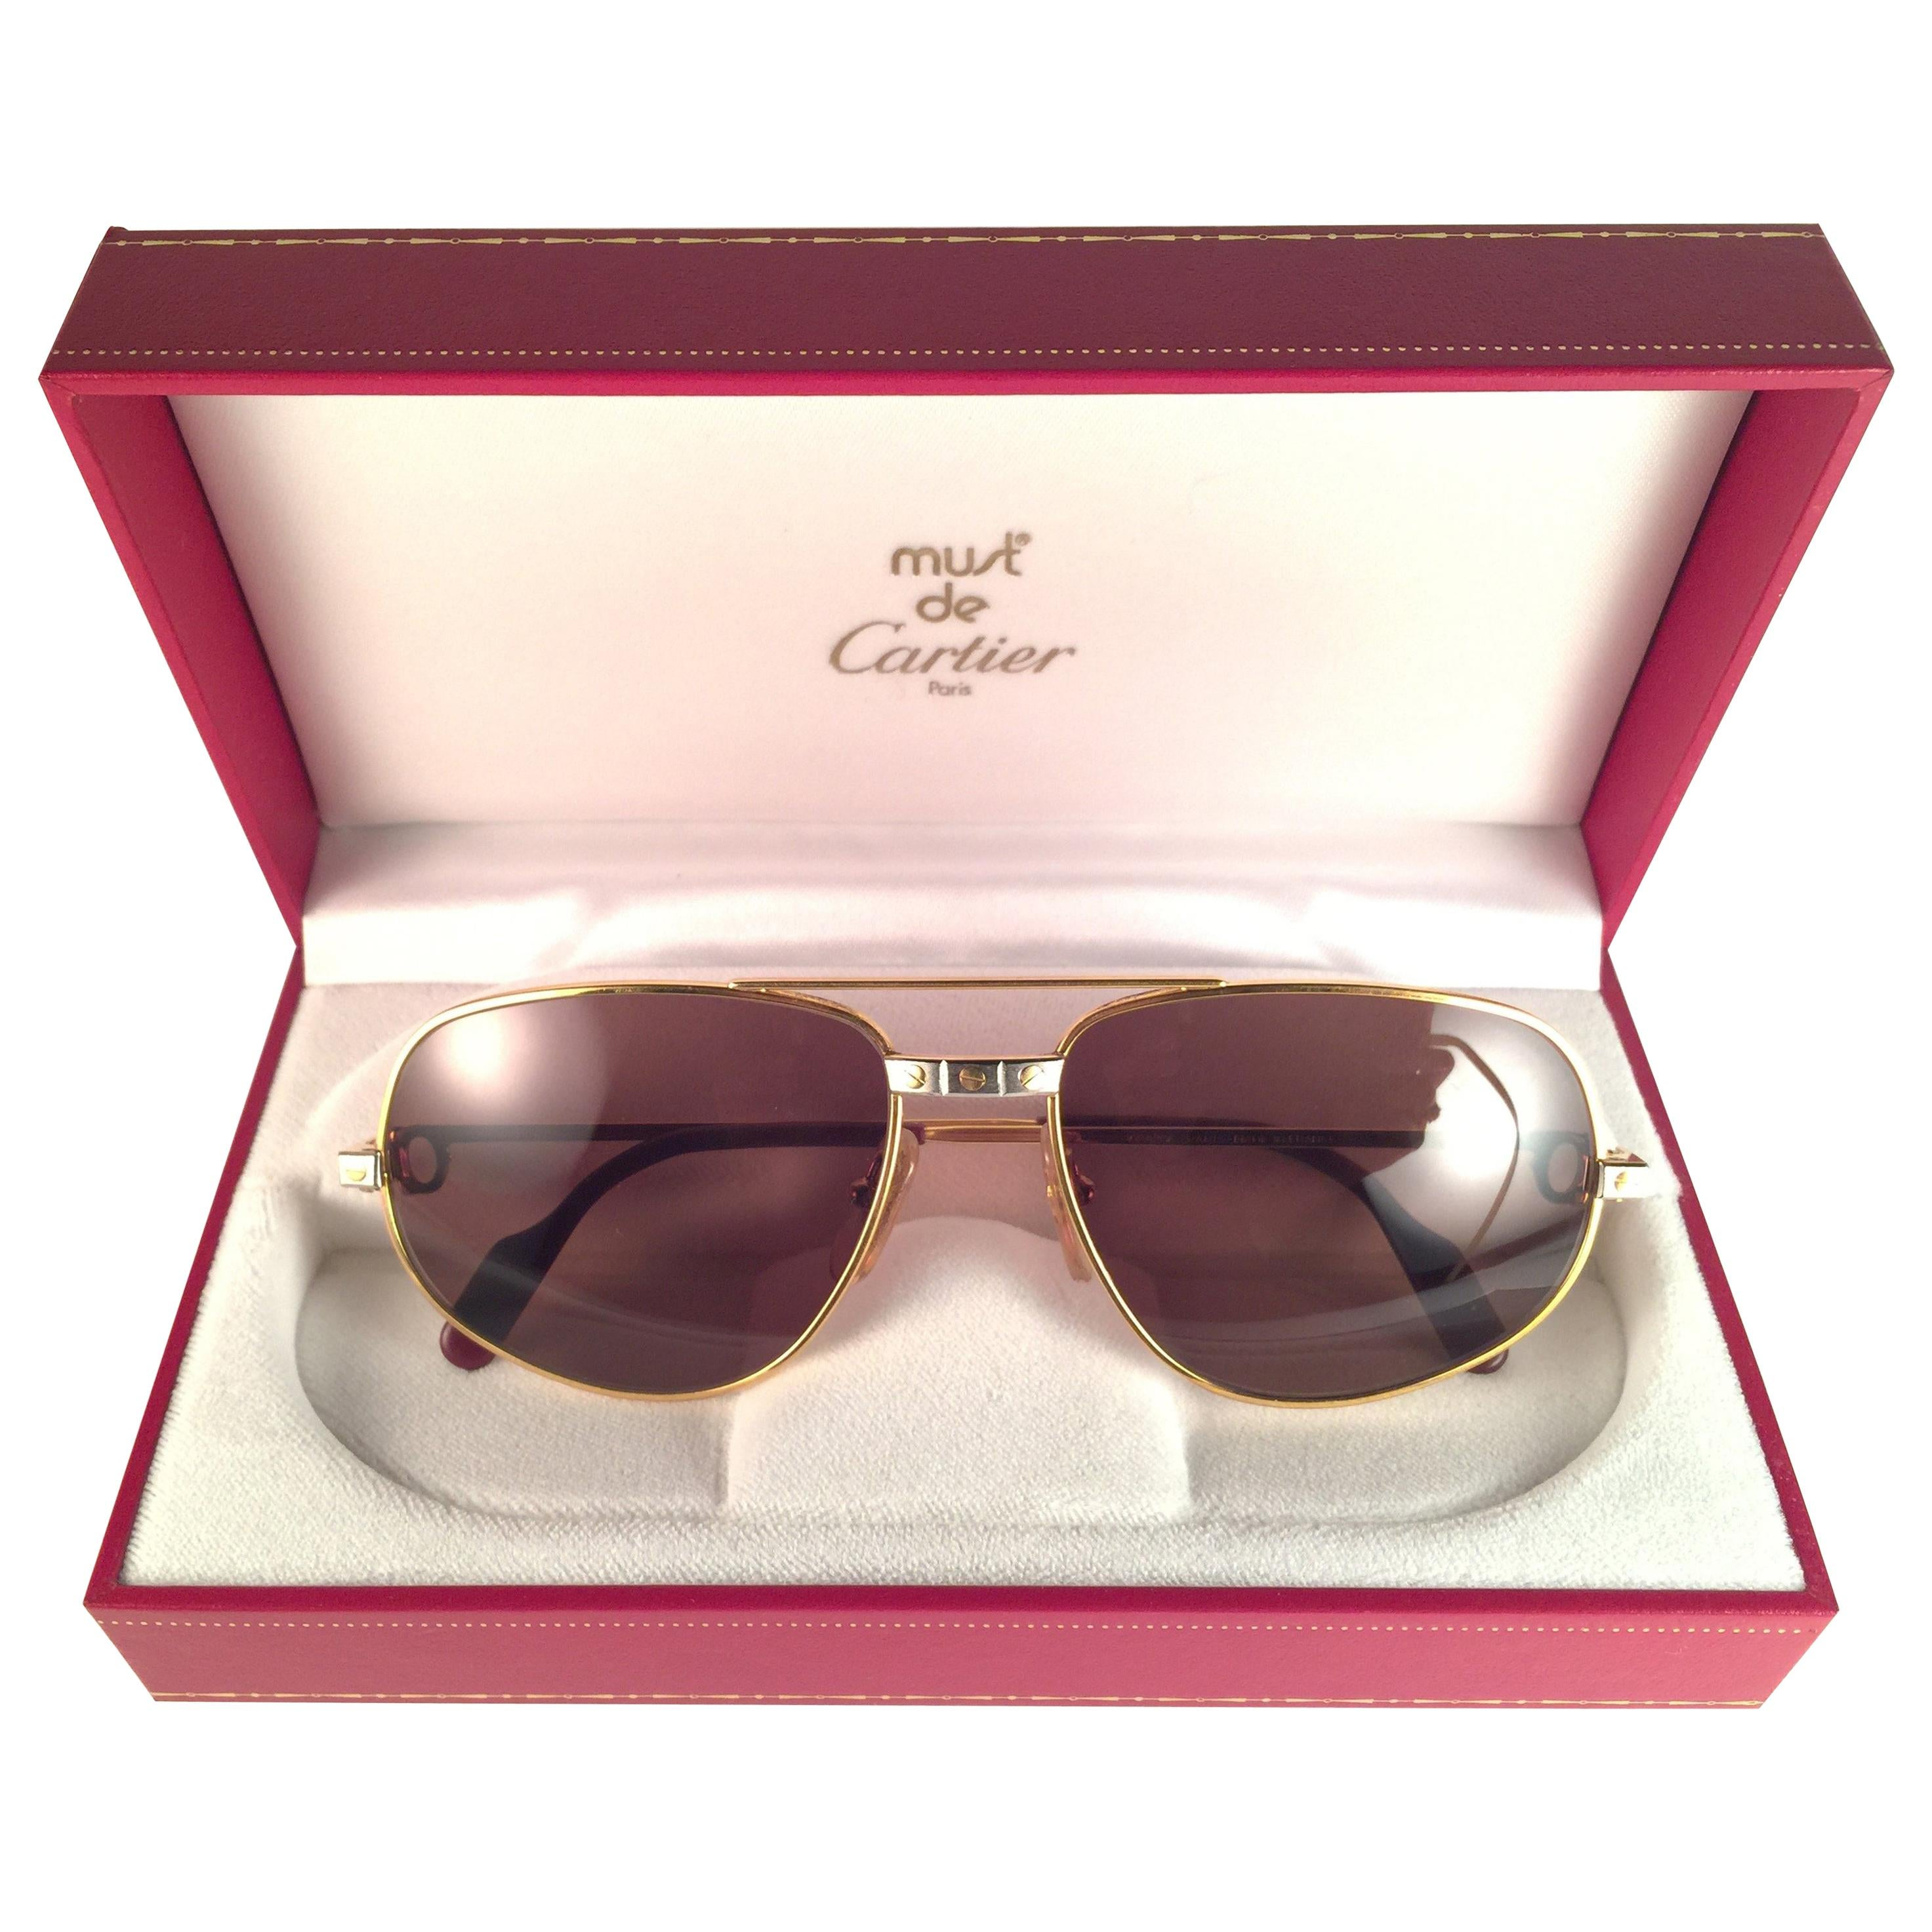 New Vintage Cartier Romance Santos 58MM France 18k Gold Plated Sunglasses